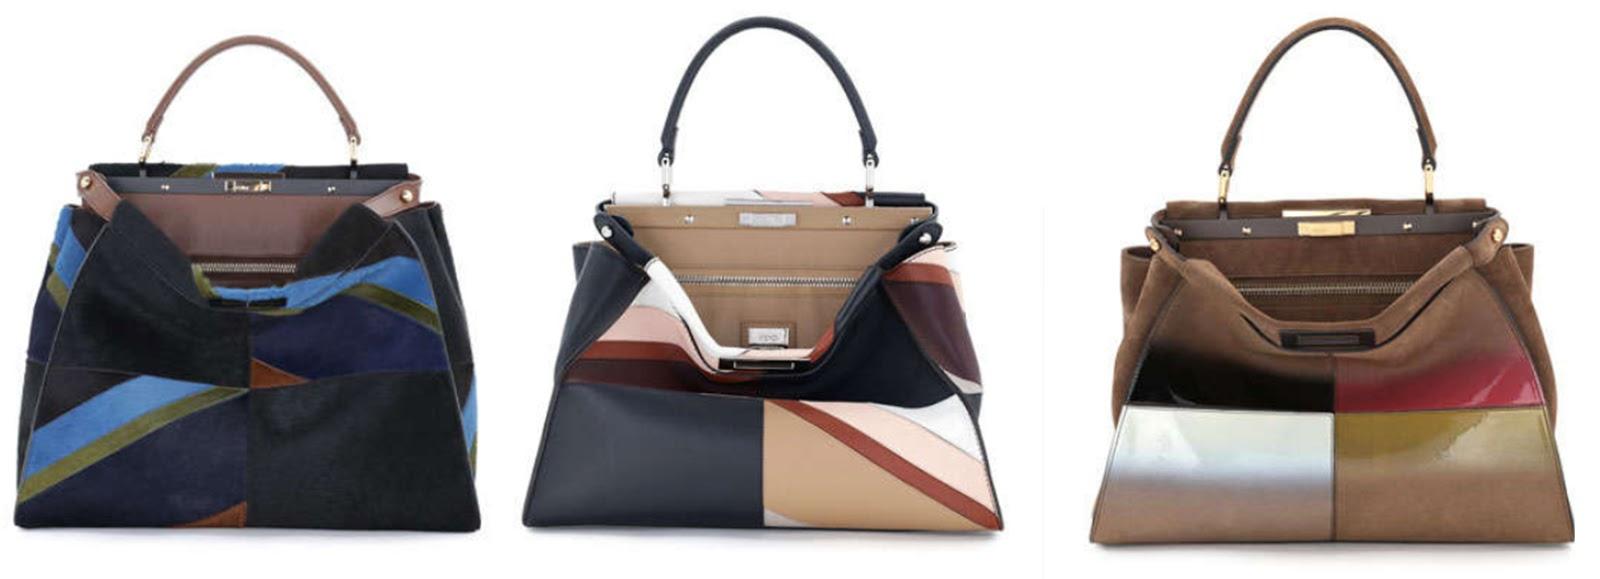 d4422b83a853 Would You Carry That Bag  Fendi Peekaboo Bag